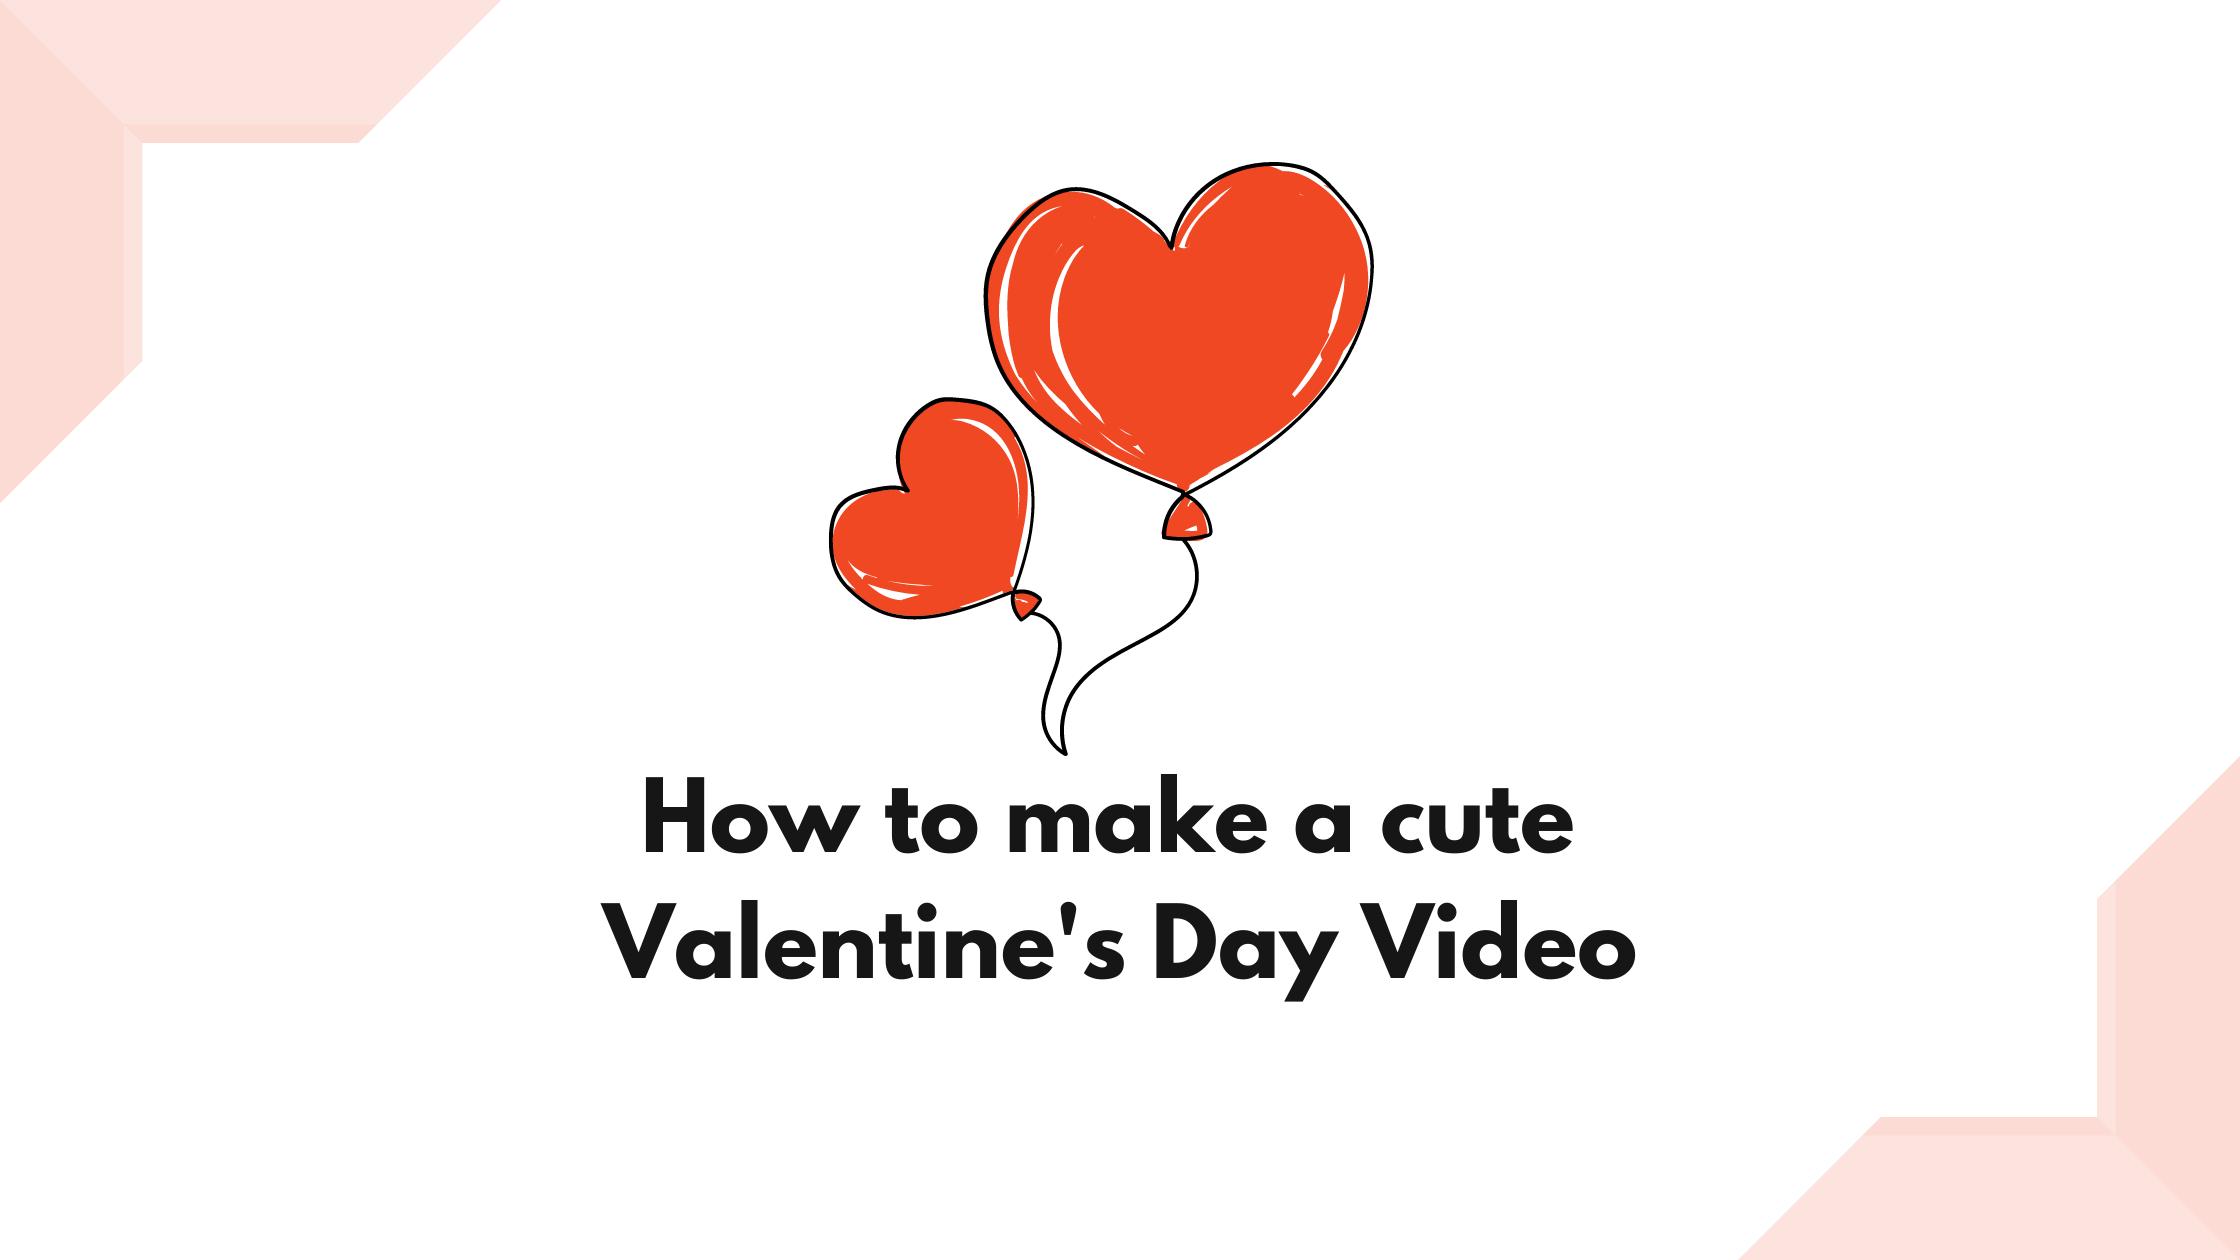 Make a valentine's day video